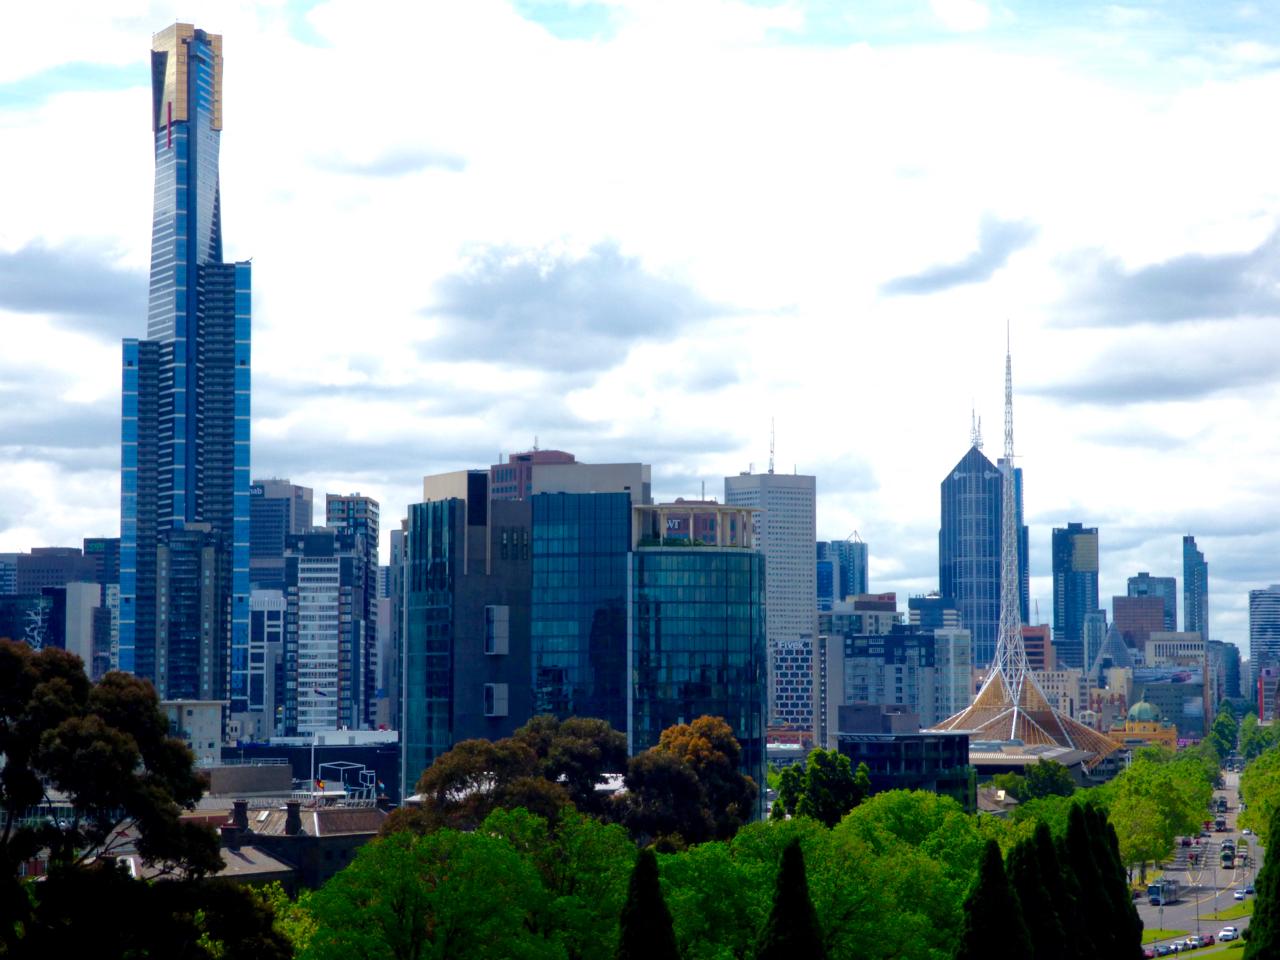 Eurkea Tower Melbourne, Australia